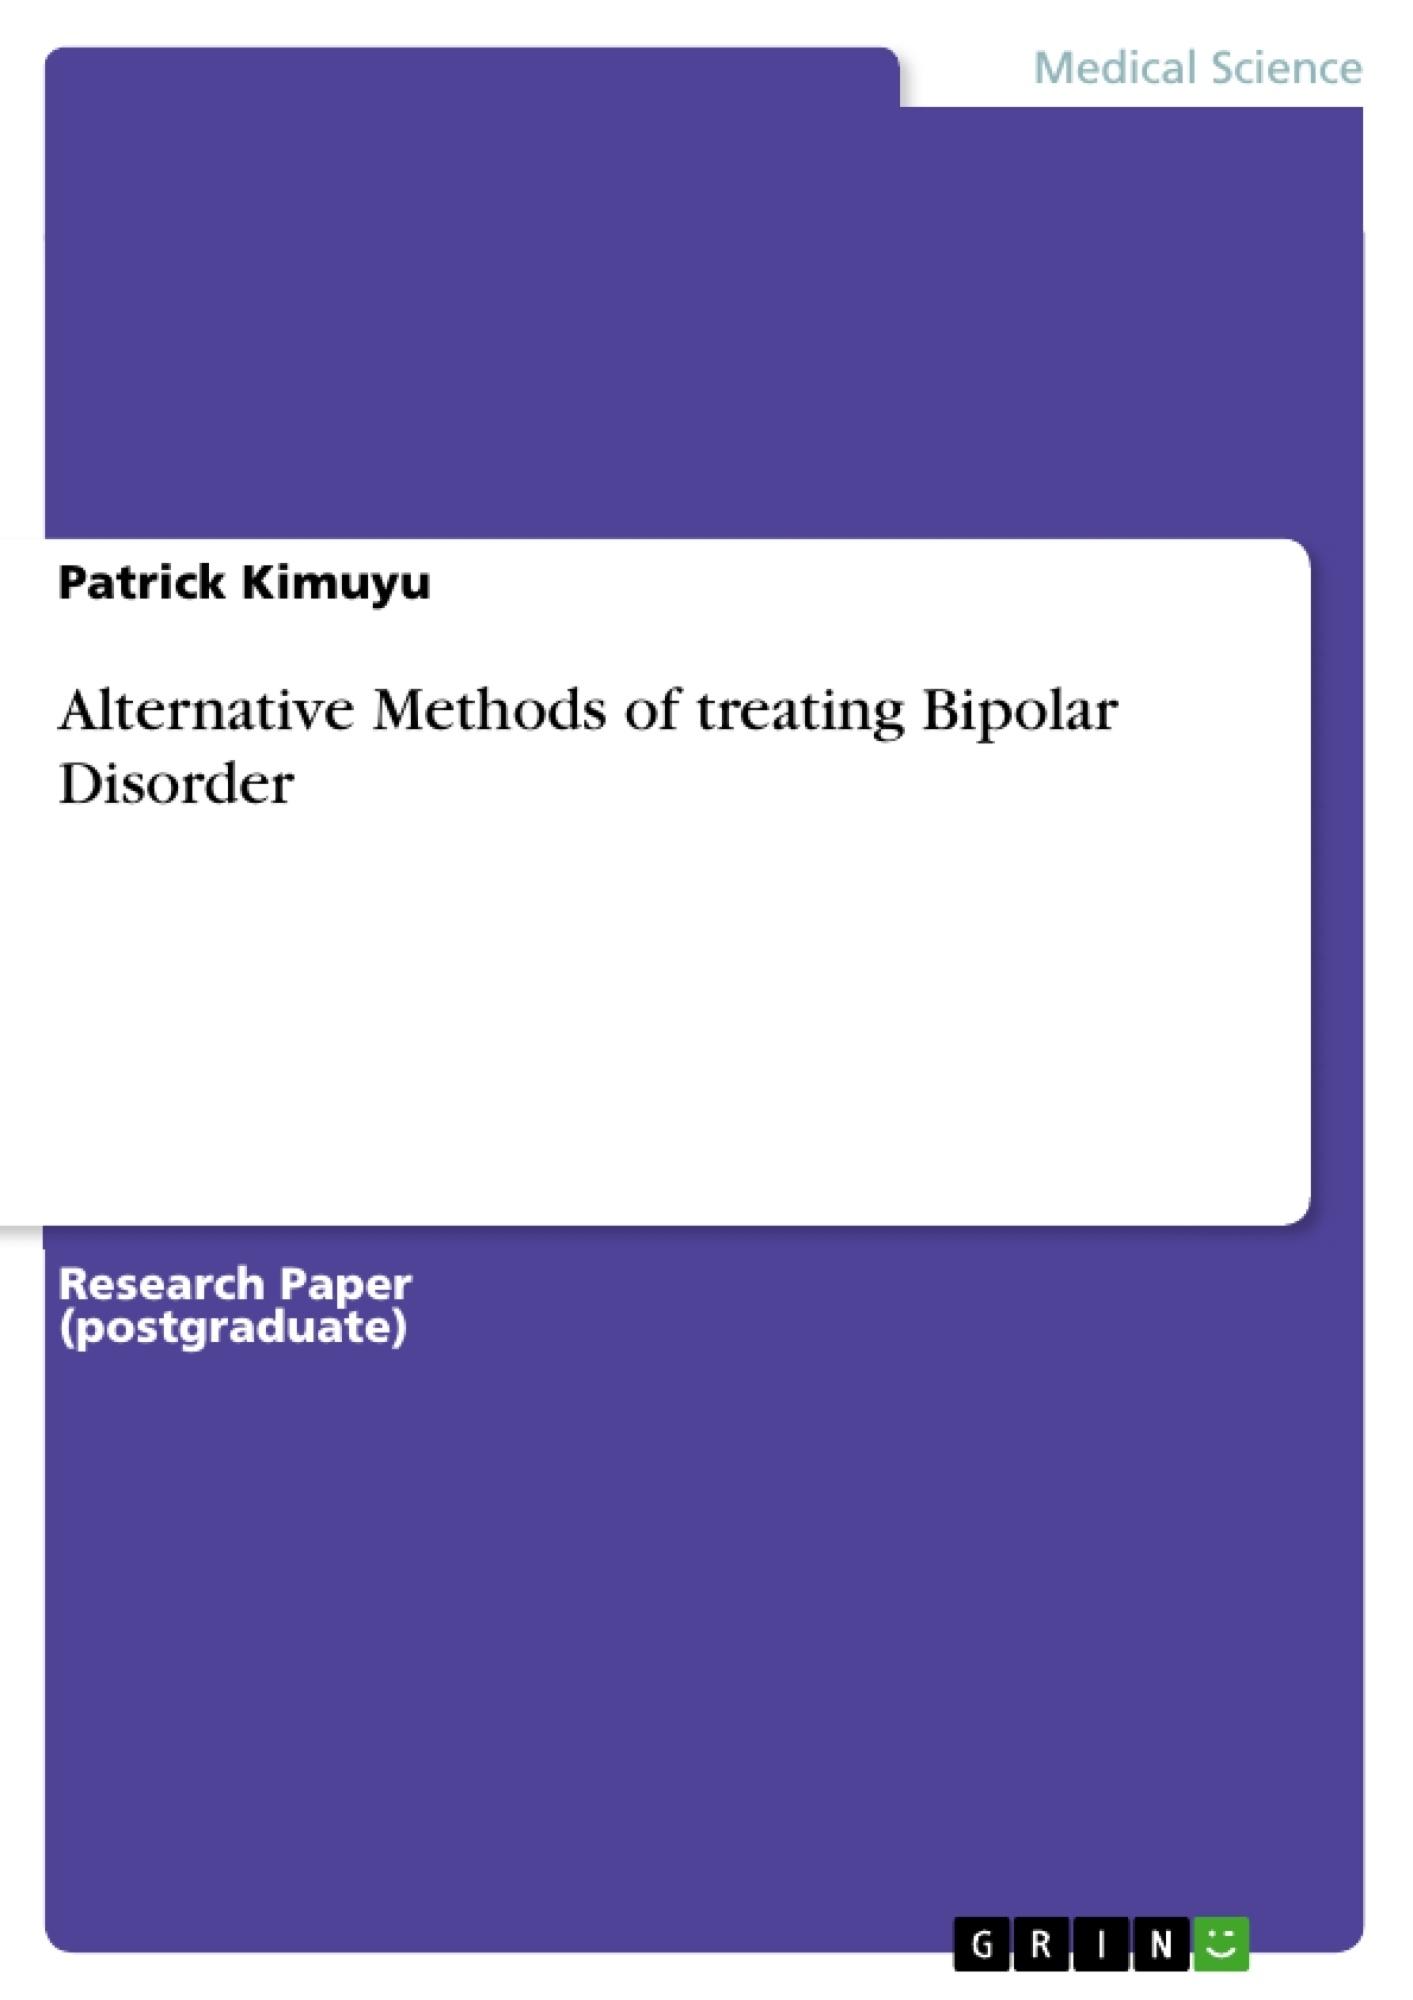 Title: Alternative Methods of treating Bipolar Disorder